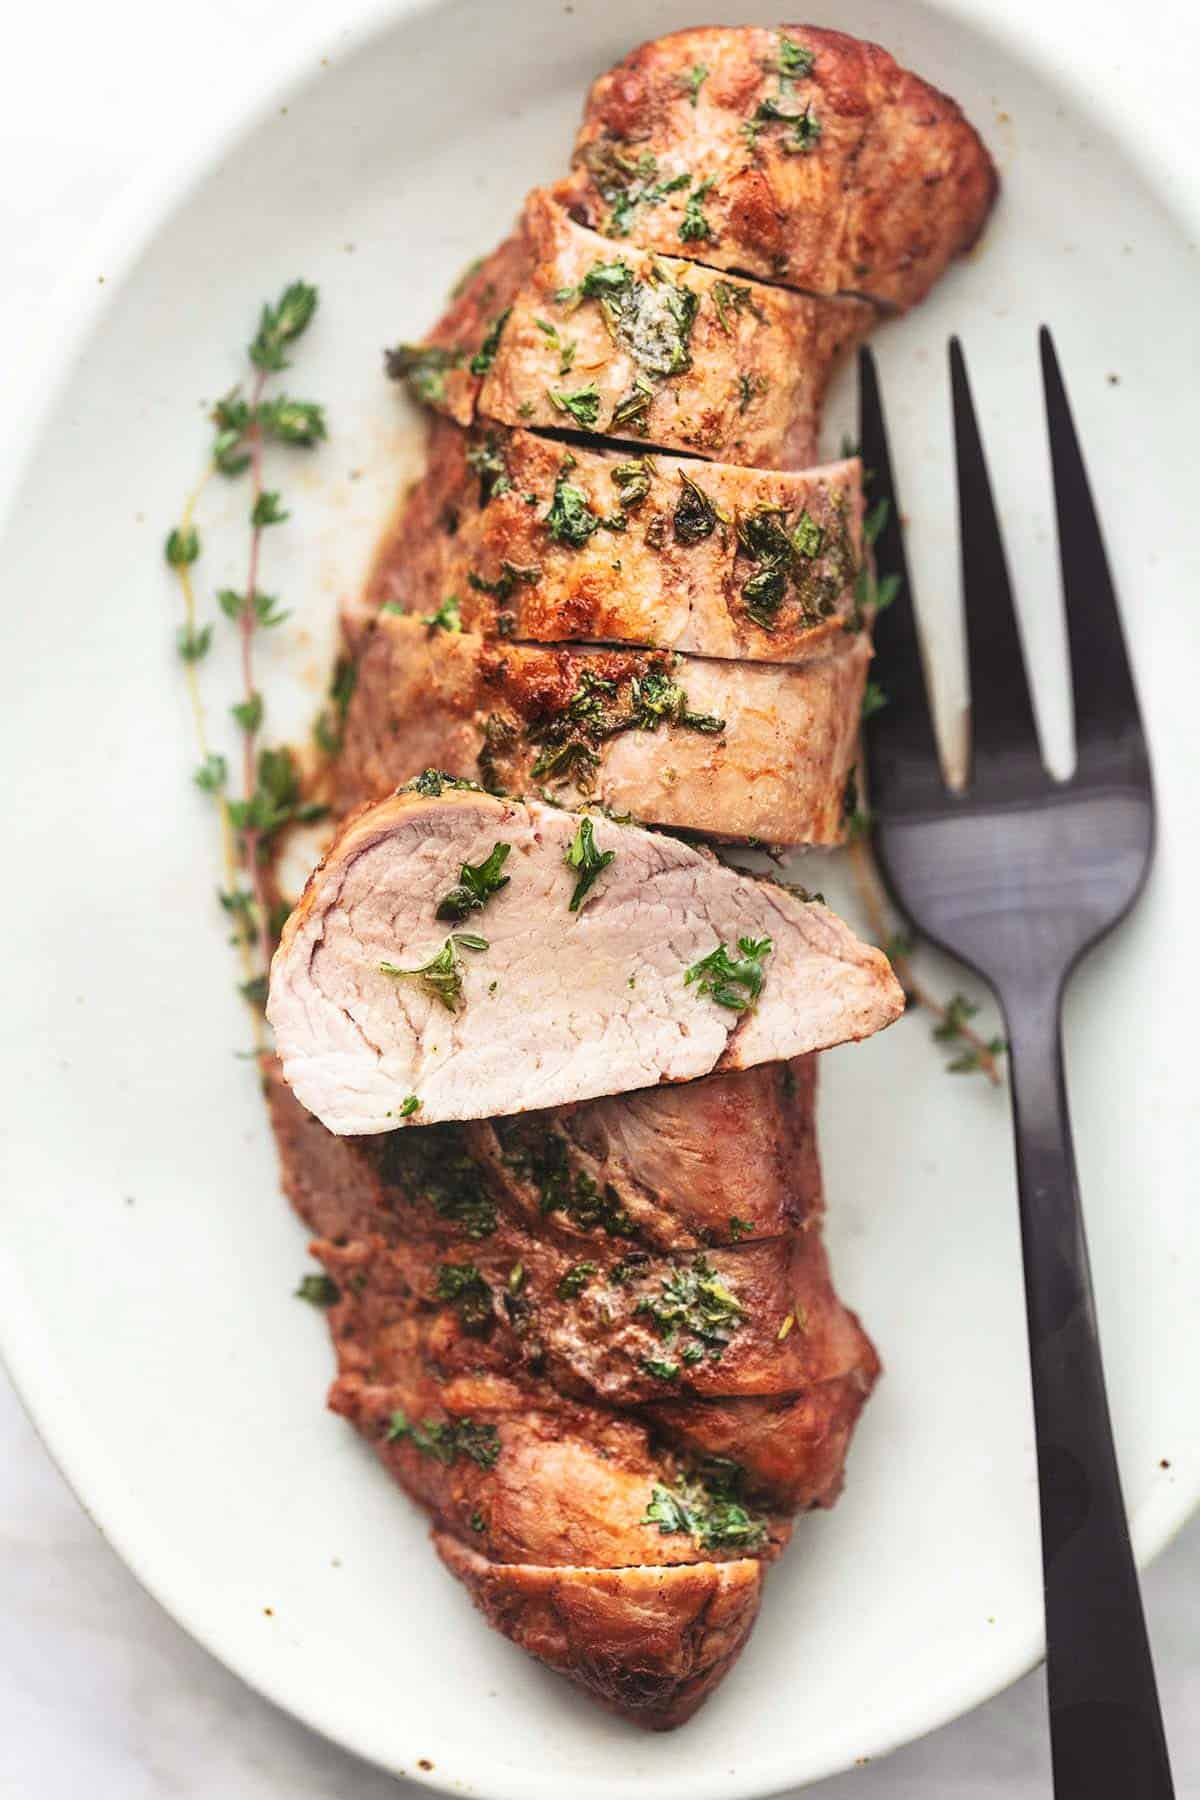 close up top view of garlic butter roasted pork tenderloin sliced on a platter with a serving fork.